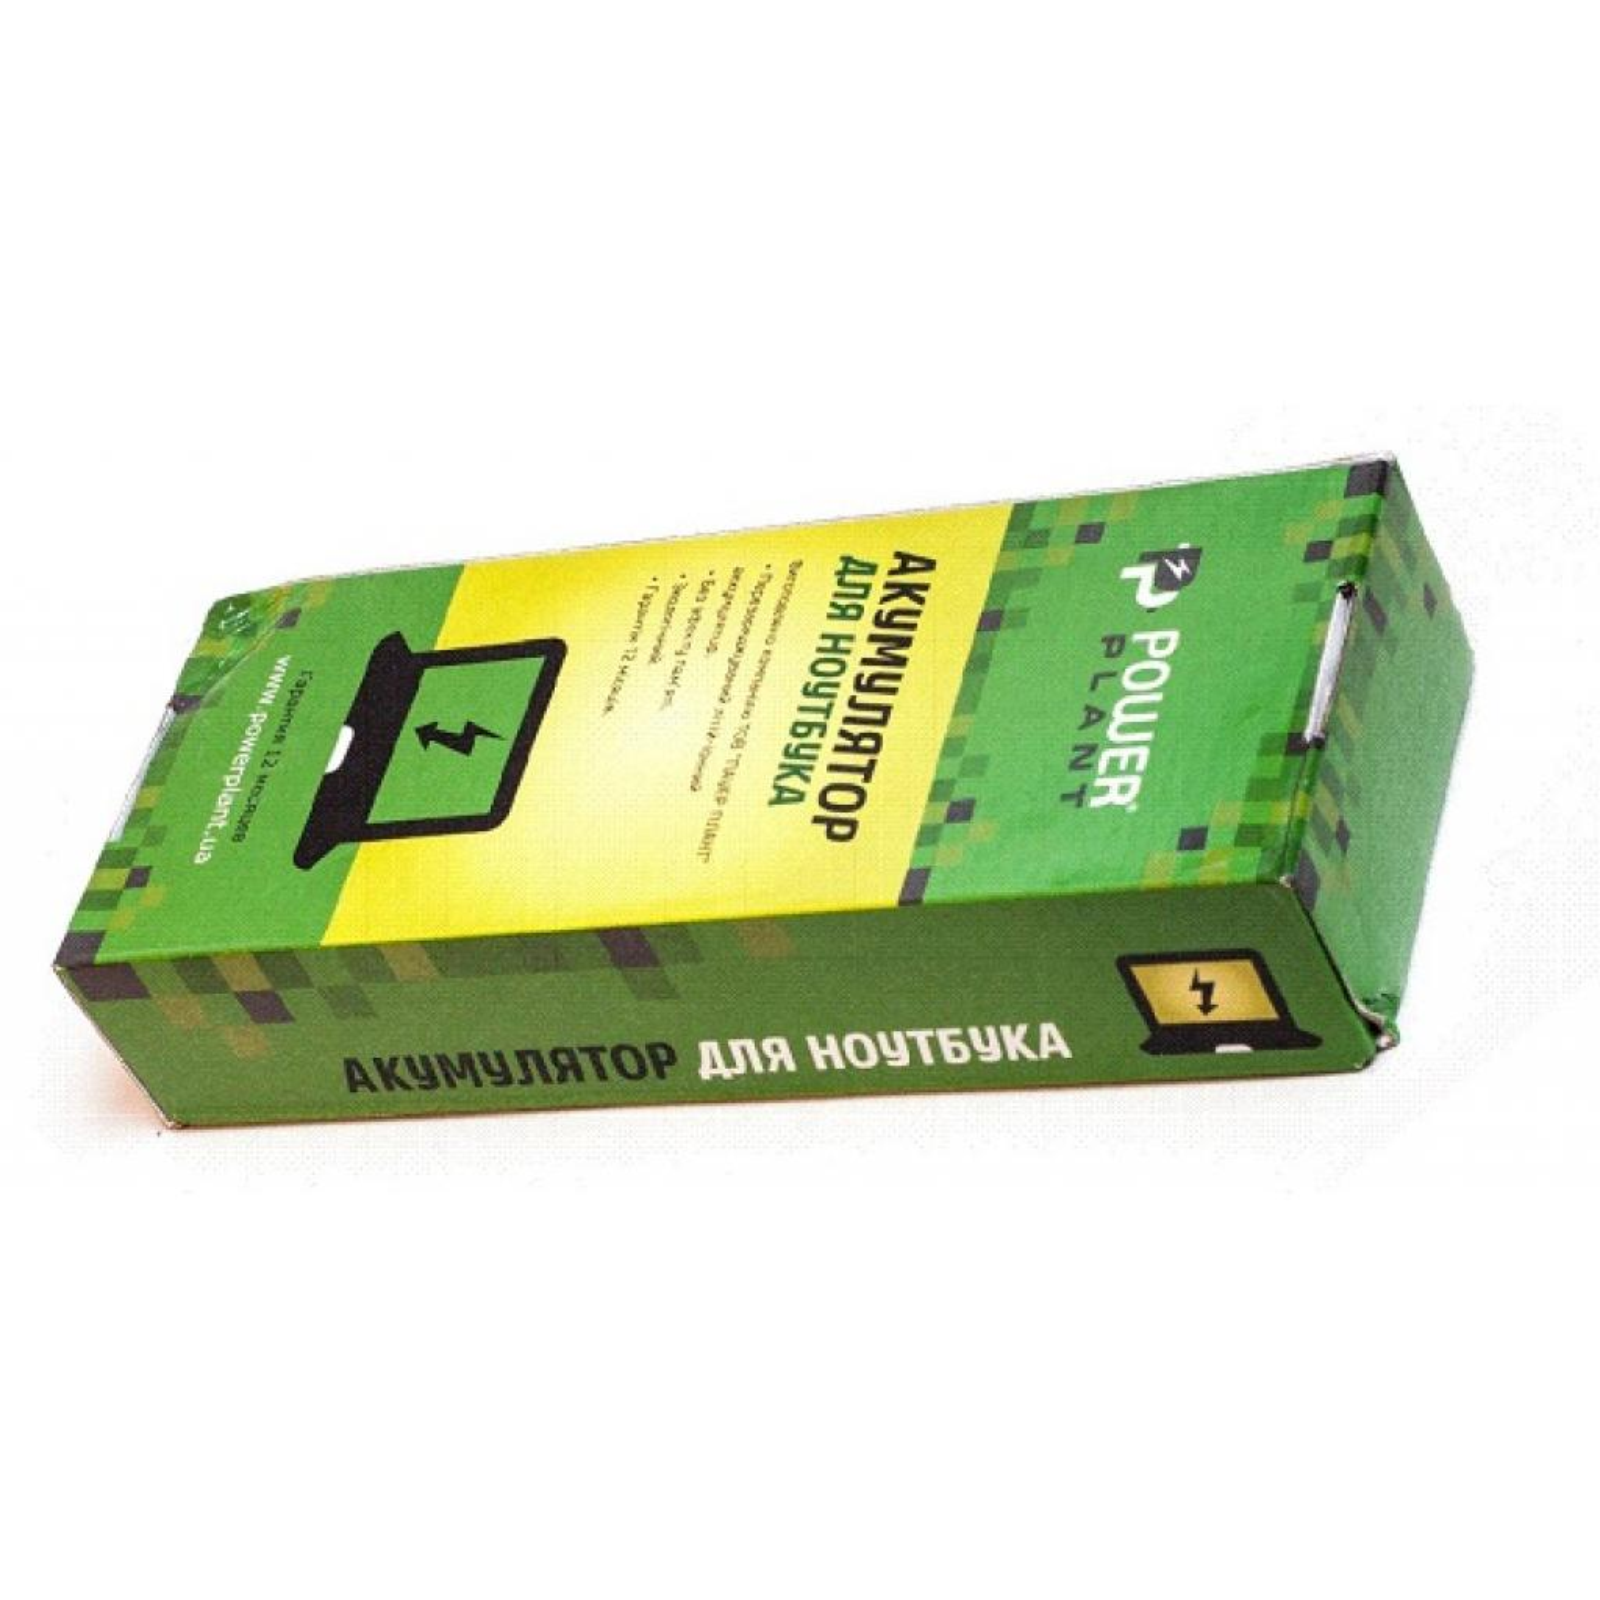 Аккумулятор для ноутбука HP 4510S (HSTNN-IB88, H4710LH) 14.4V 5200mAh PowerPlant (NB00000079) изображение 3